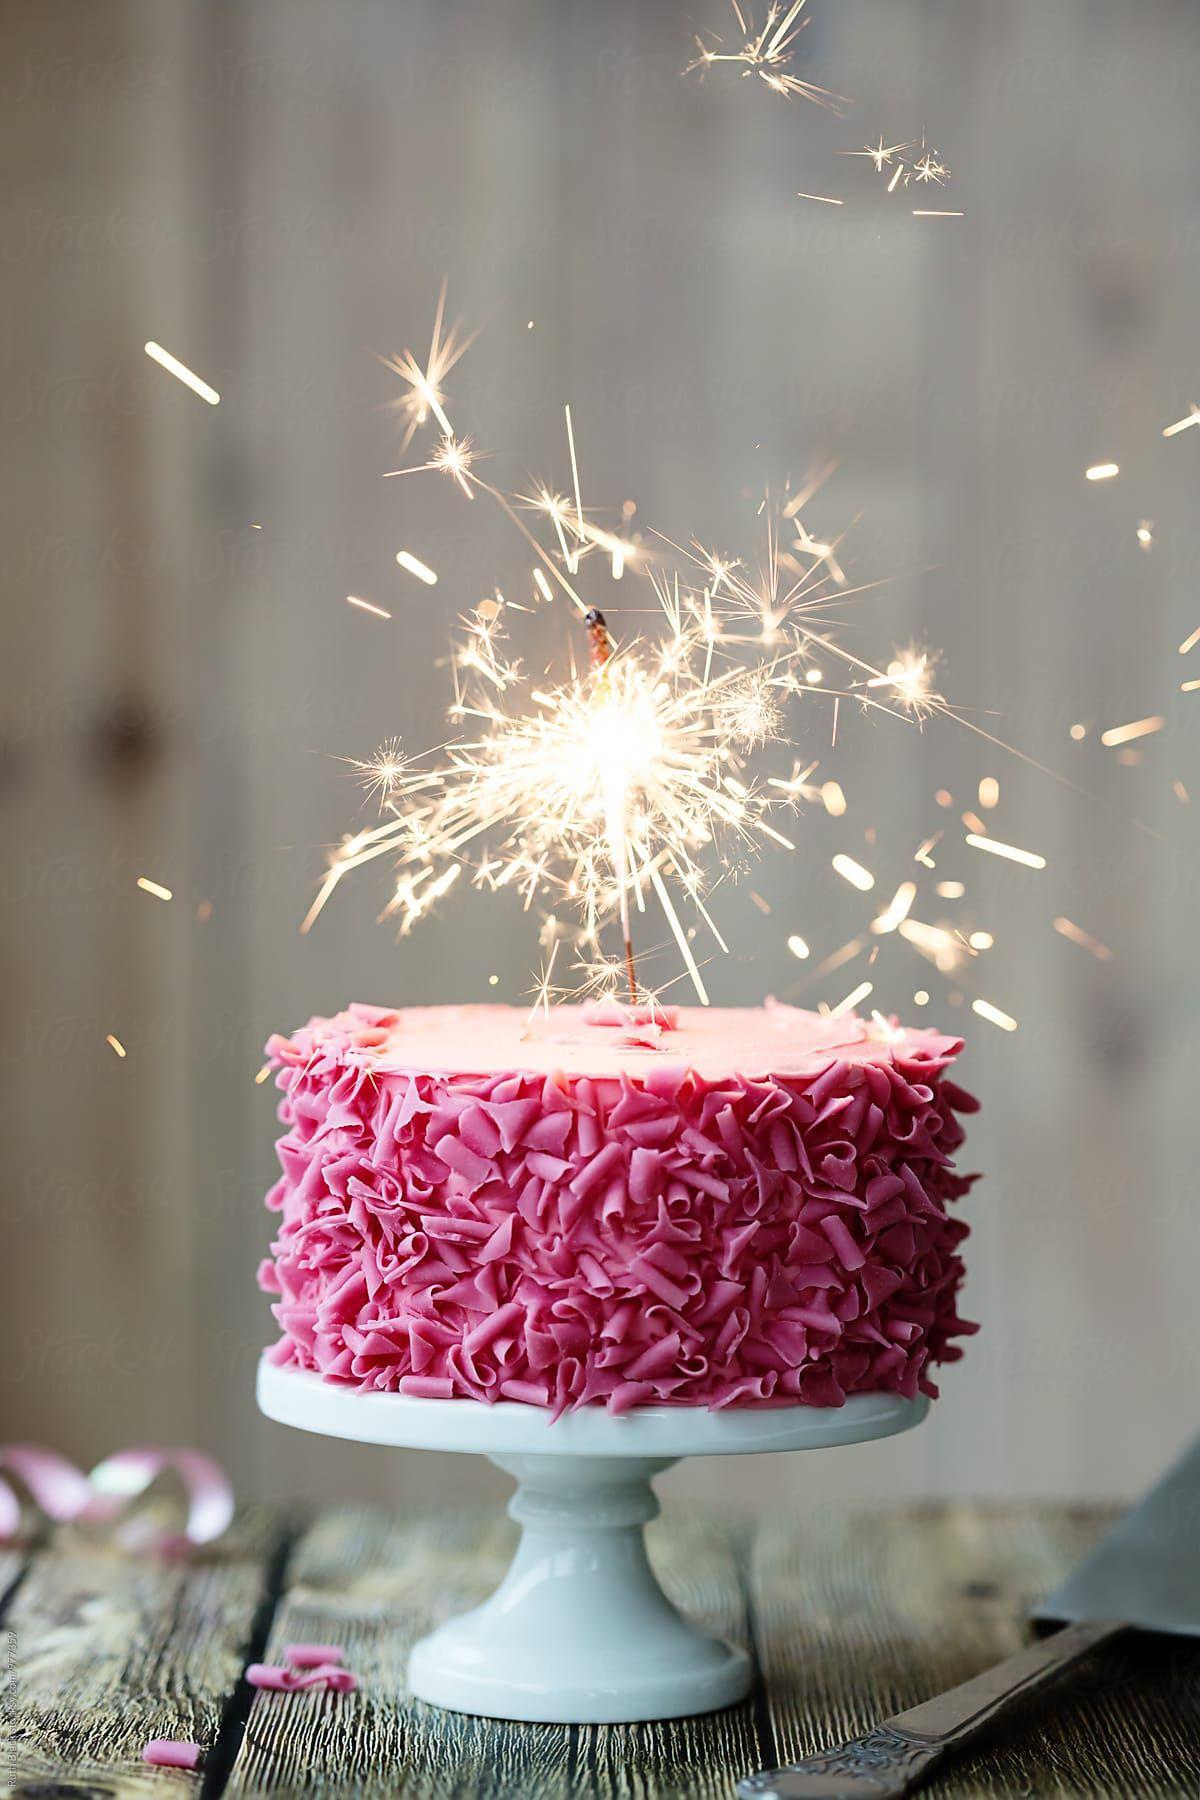 Awesome Pink Celebration Cake With Sparkler Stocksy United Cake Funny Birthday Cards Online Inifodamsfinfo